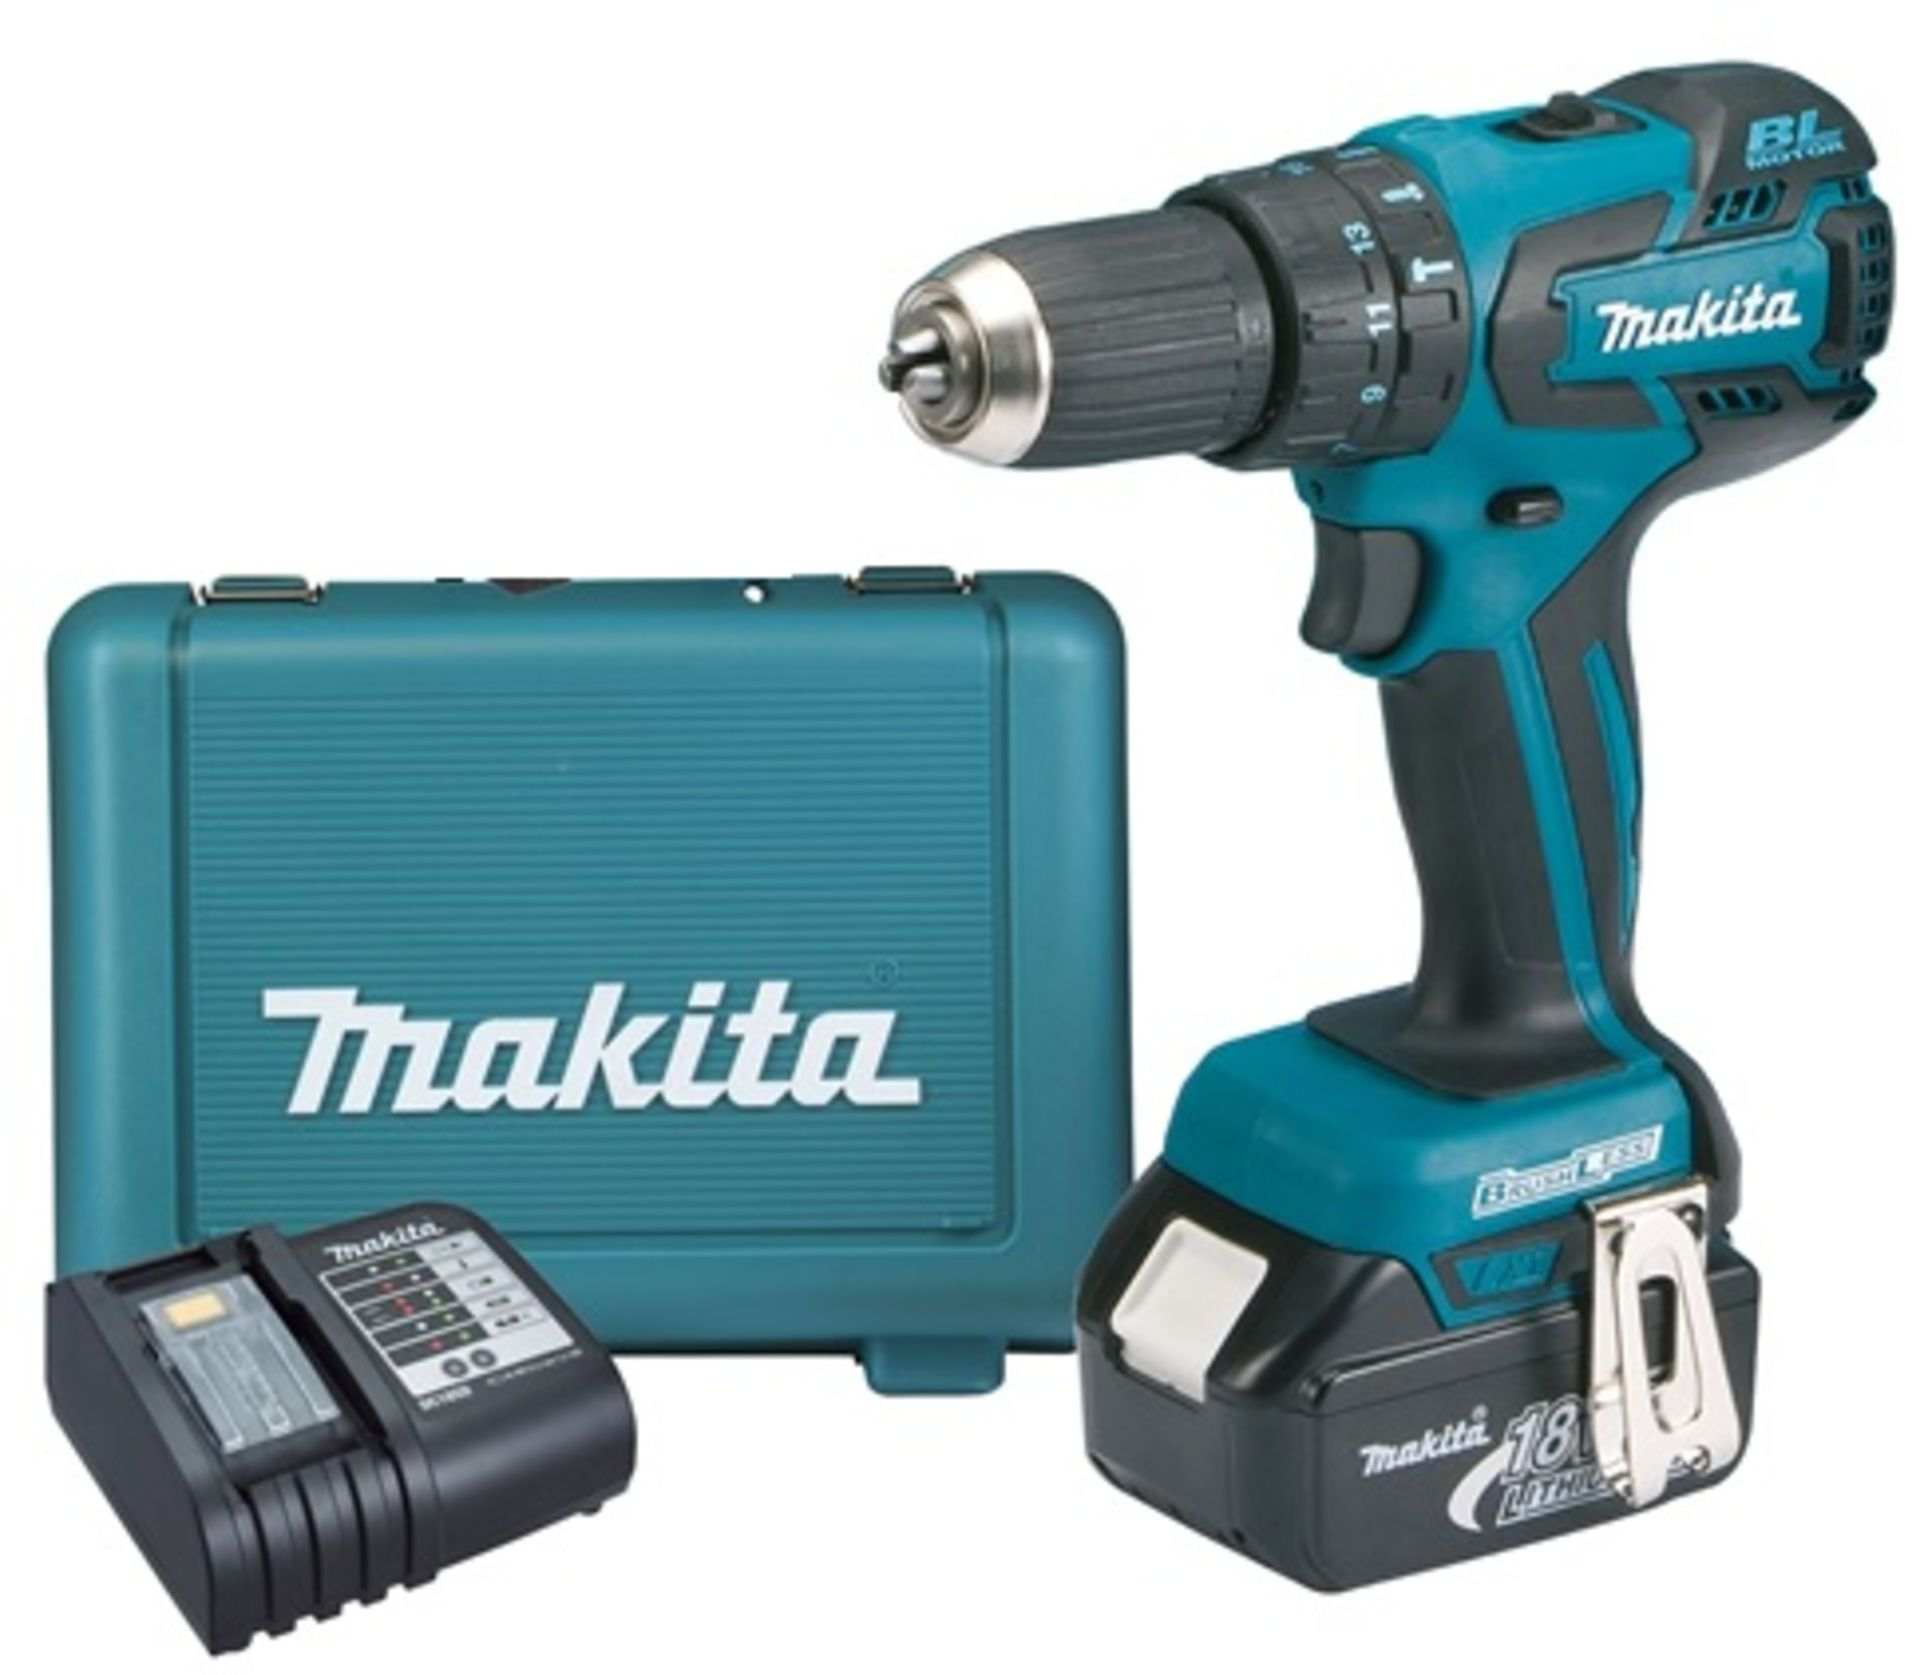 Lot 11558 - V Brand New Makita 18v Brushless Combi Drill (All Metal Gearing) + 4Ah Battery + Charger + Makita